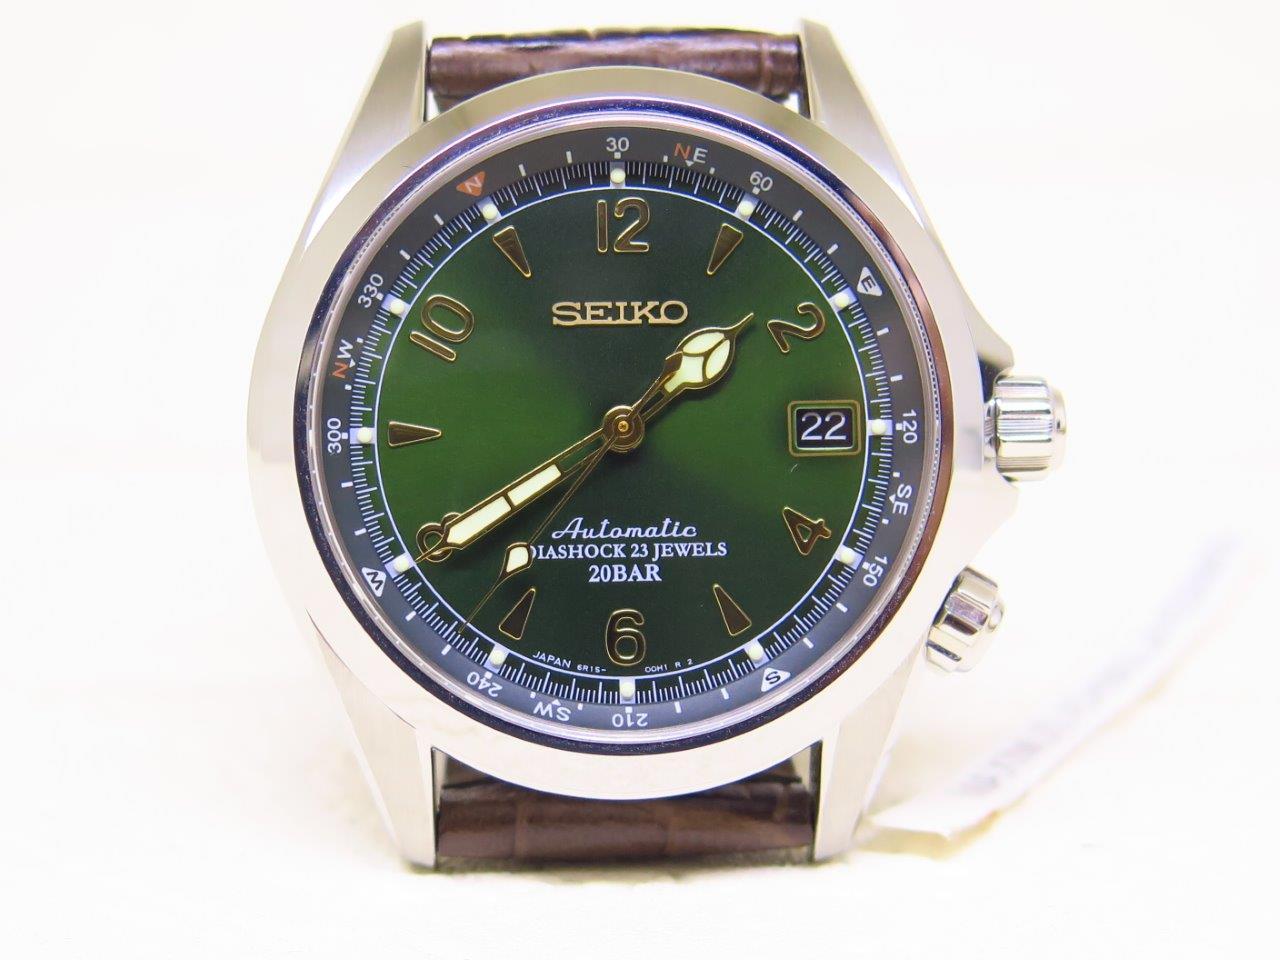 SEIKO ALPINIST SUNBURST GREEN DIAL SARB017 - AUTOMATIC 6R15